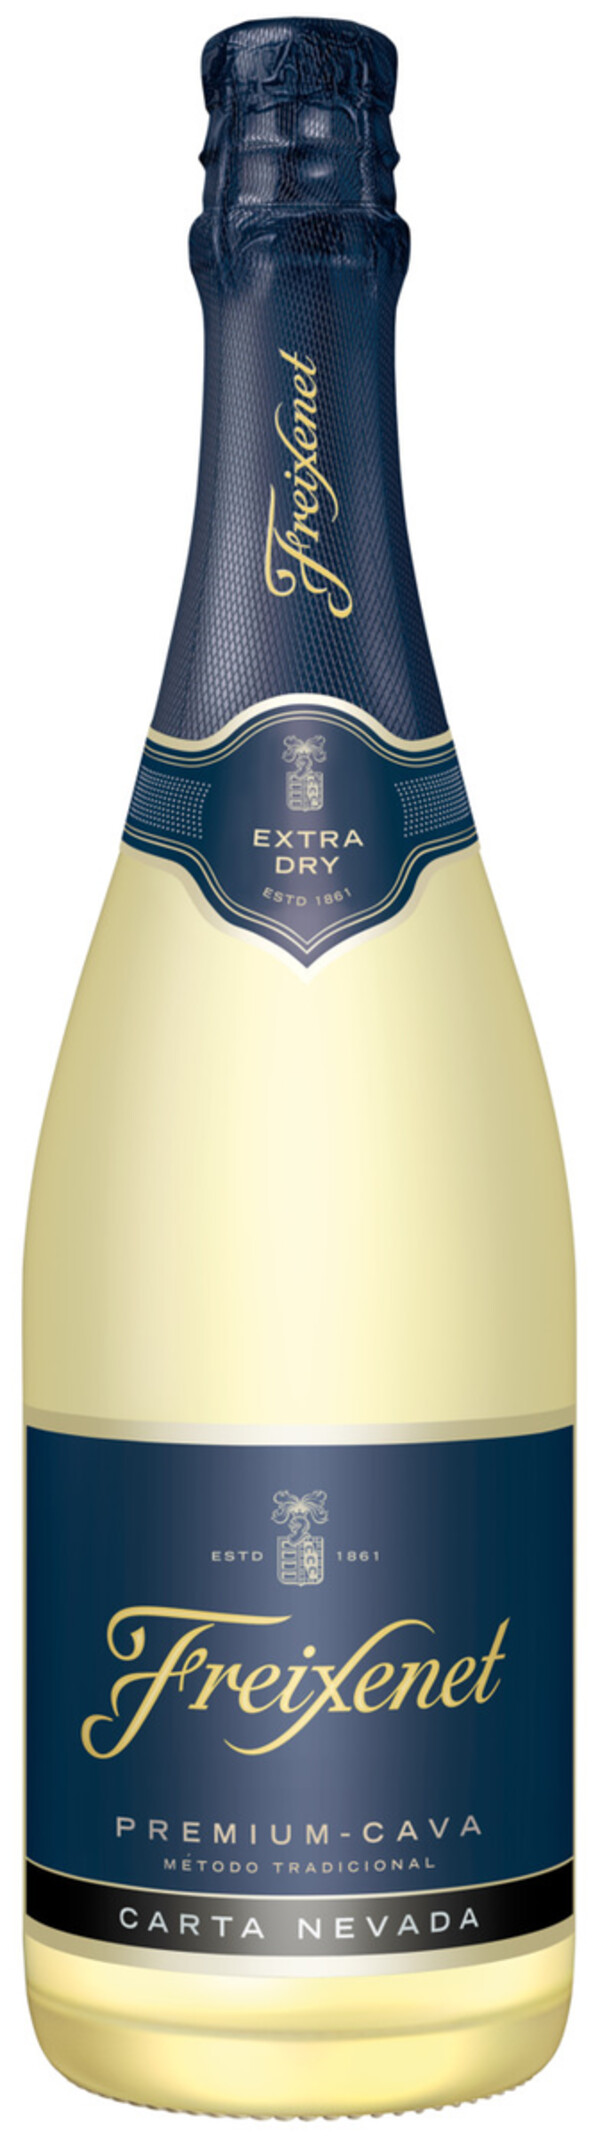 Freixenet Cava Carta Nevada Extra Dry 0,75 ltr